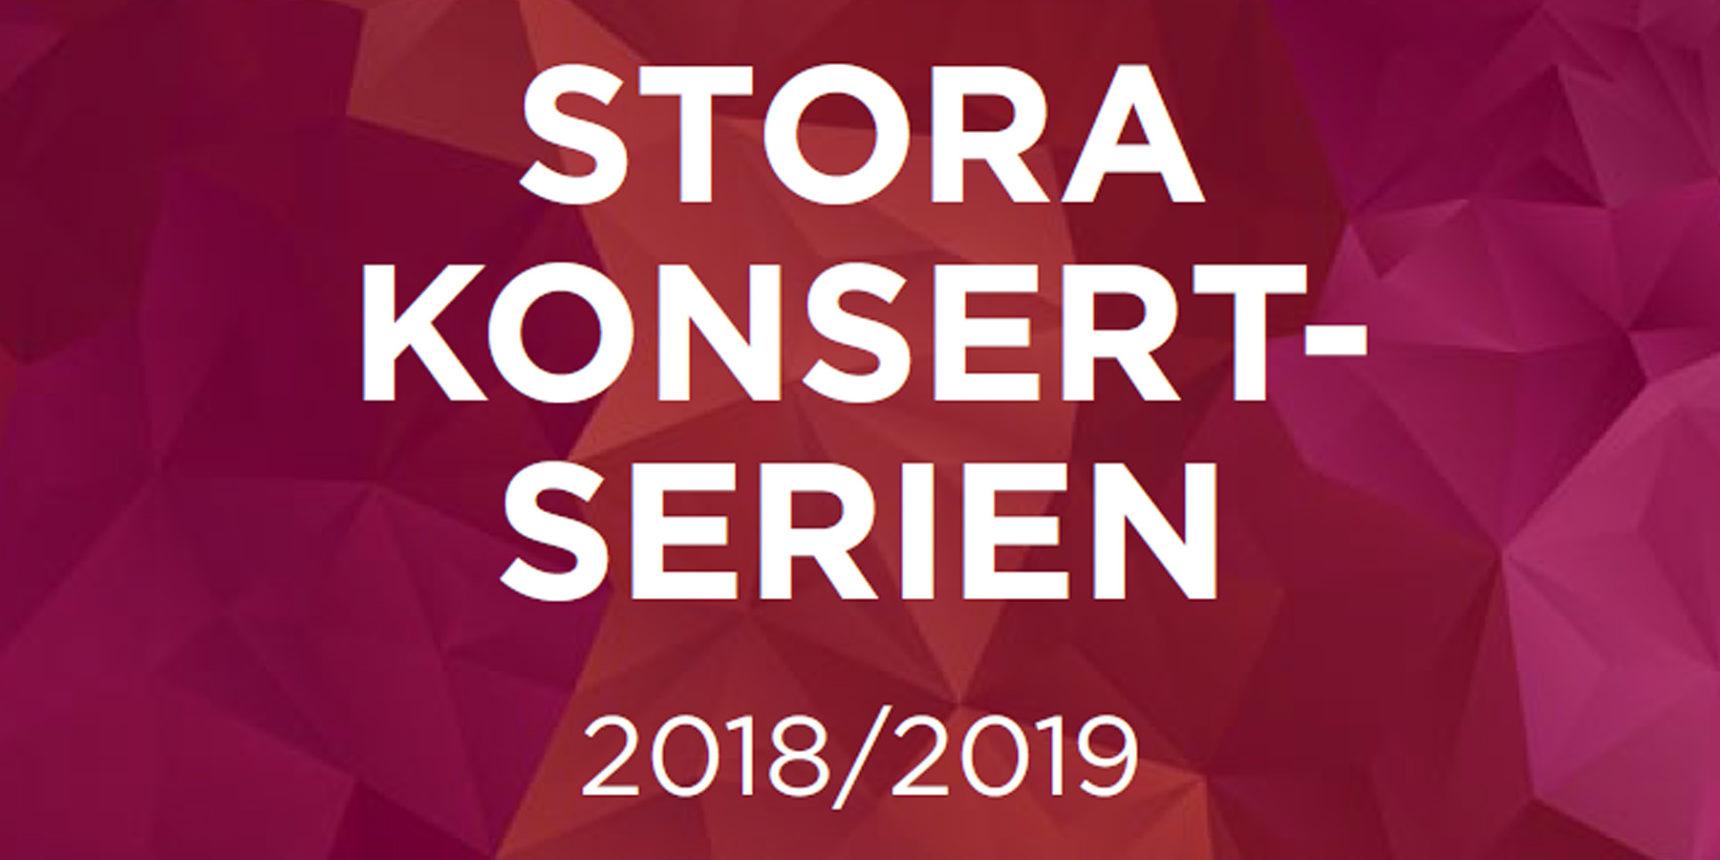 Stora Konsertserien 2018/2019